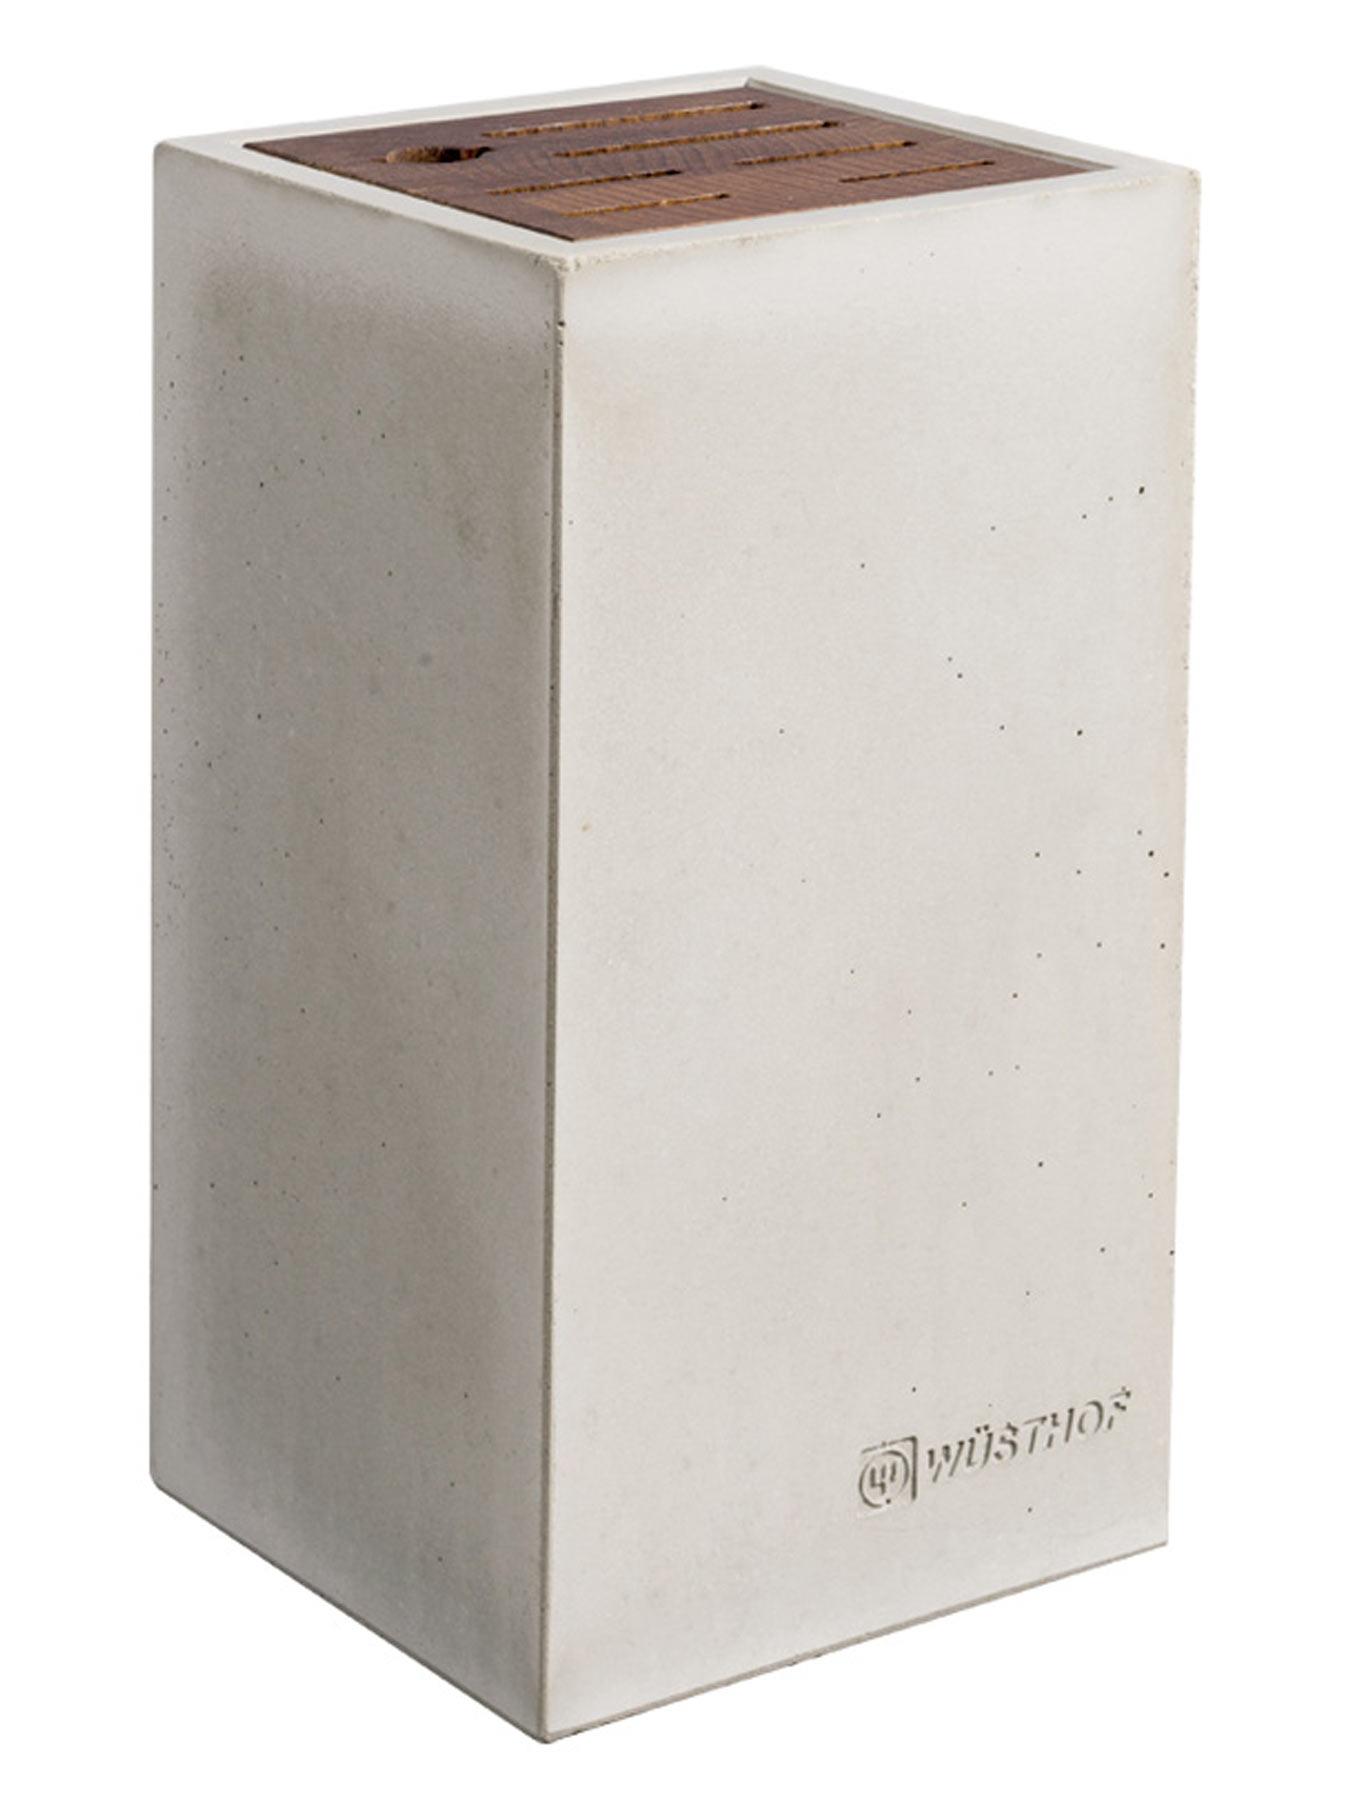 Wüsthof 7258 Messerblock Beton / Thermobuche